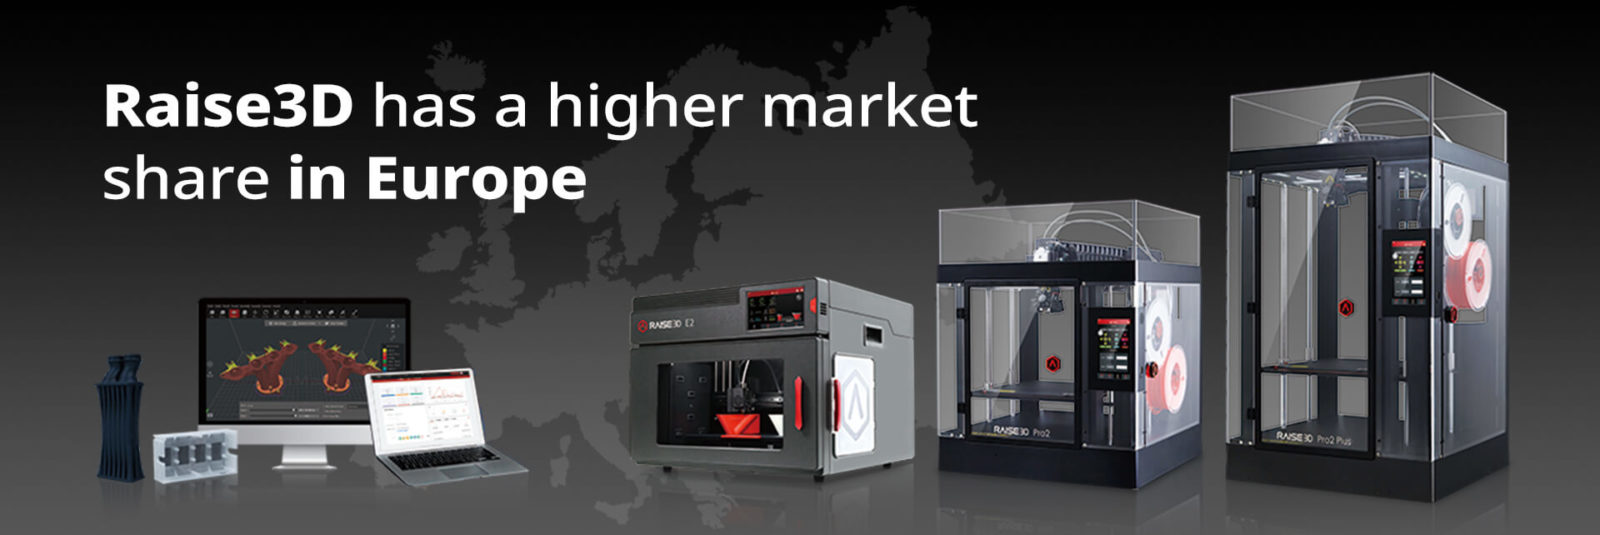 Raise3D and Its Distributor OKM3D Conquer European Market